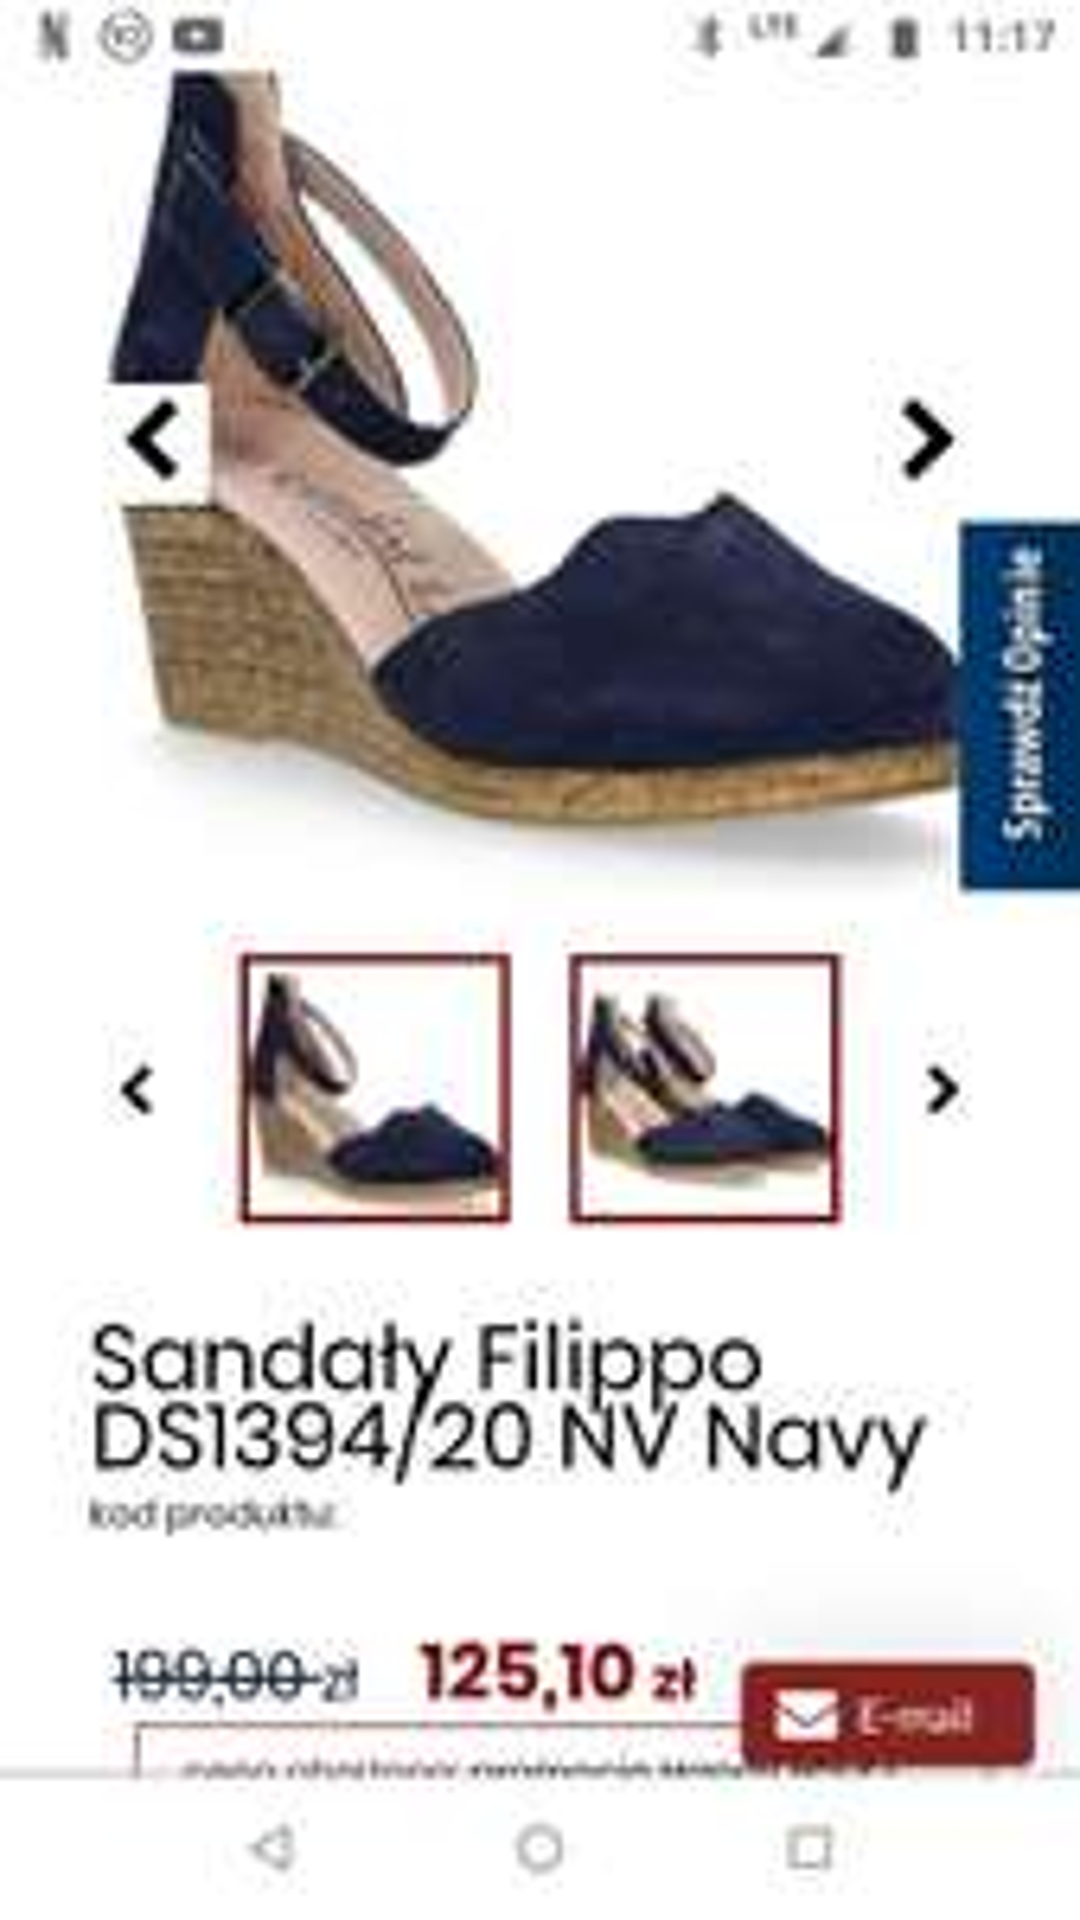 Skórzane sandały Fillipo rozmiar 37-40. Seria comfortline